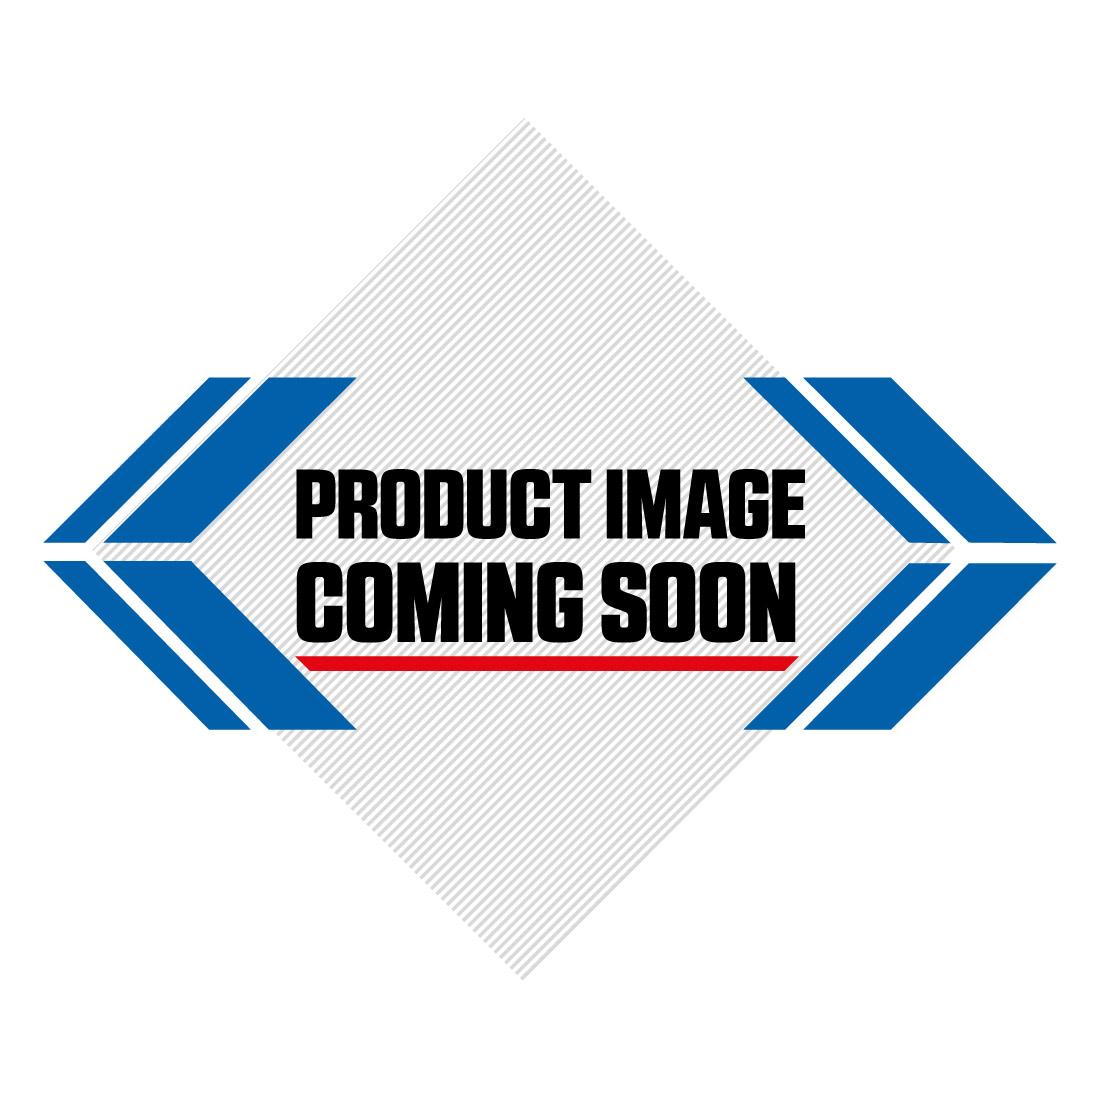 Honda Plastic Kit CRF 250 (14-17) CRF 450 (13-16) OEM Factory Image-1